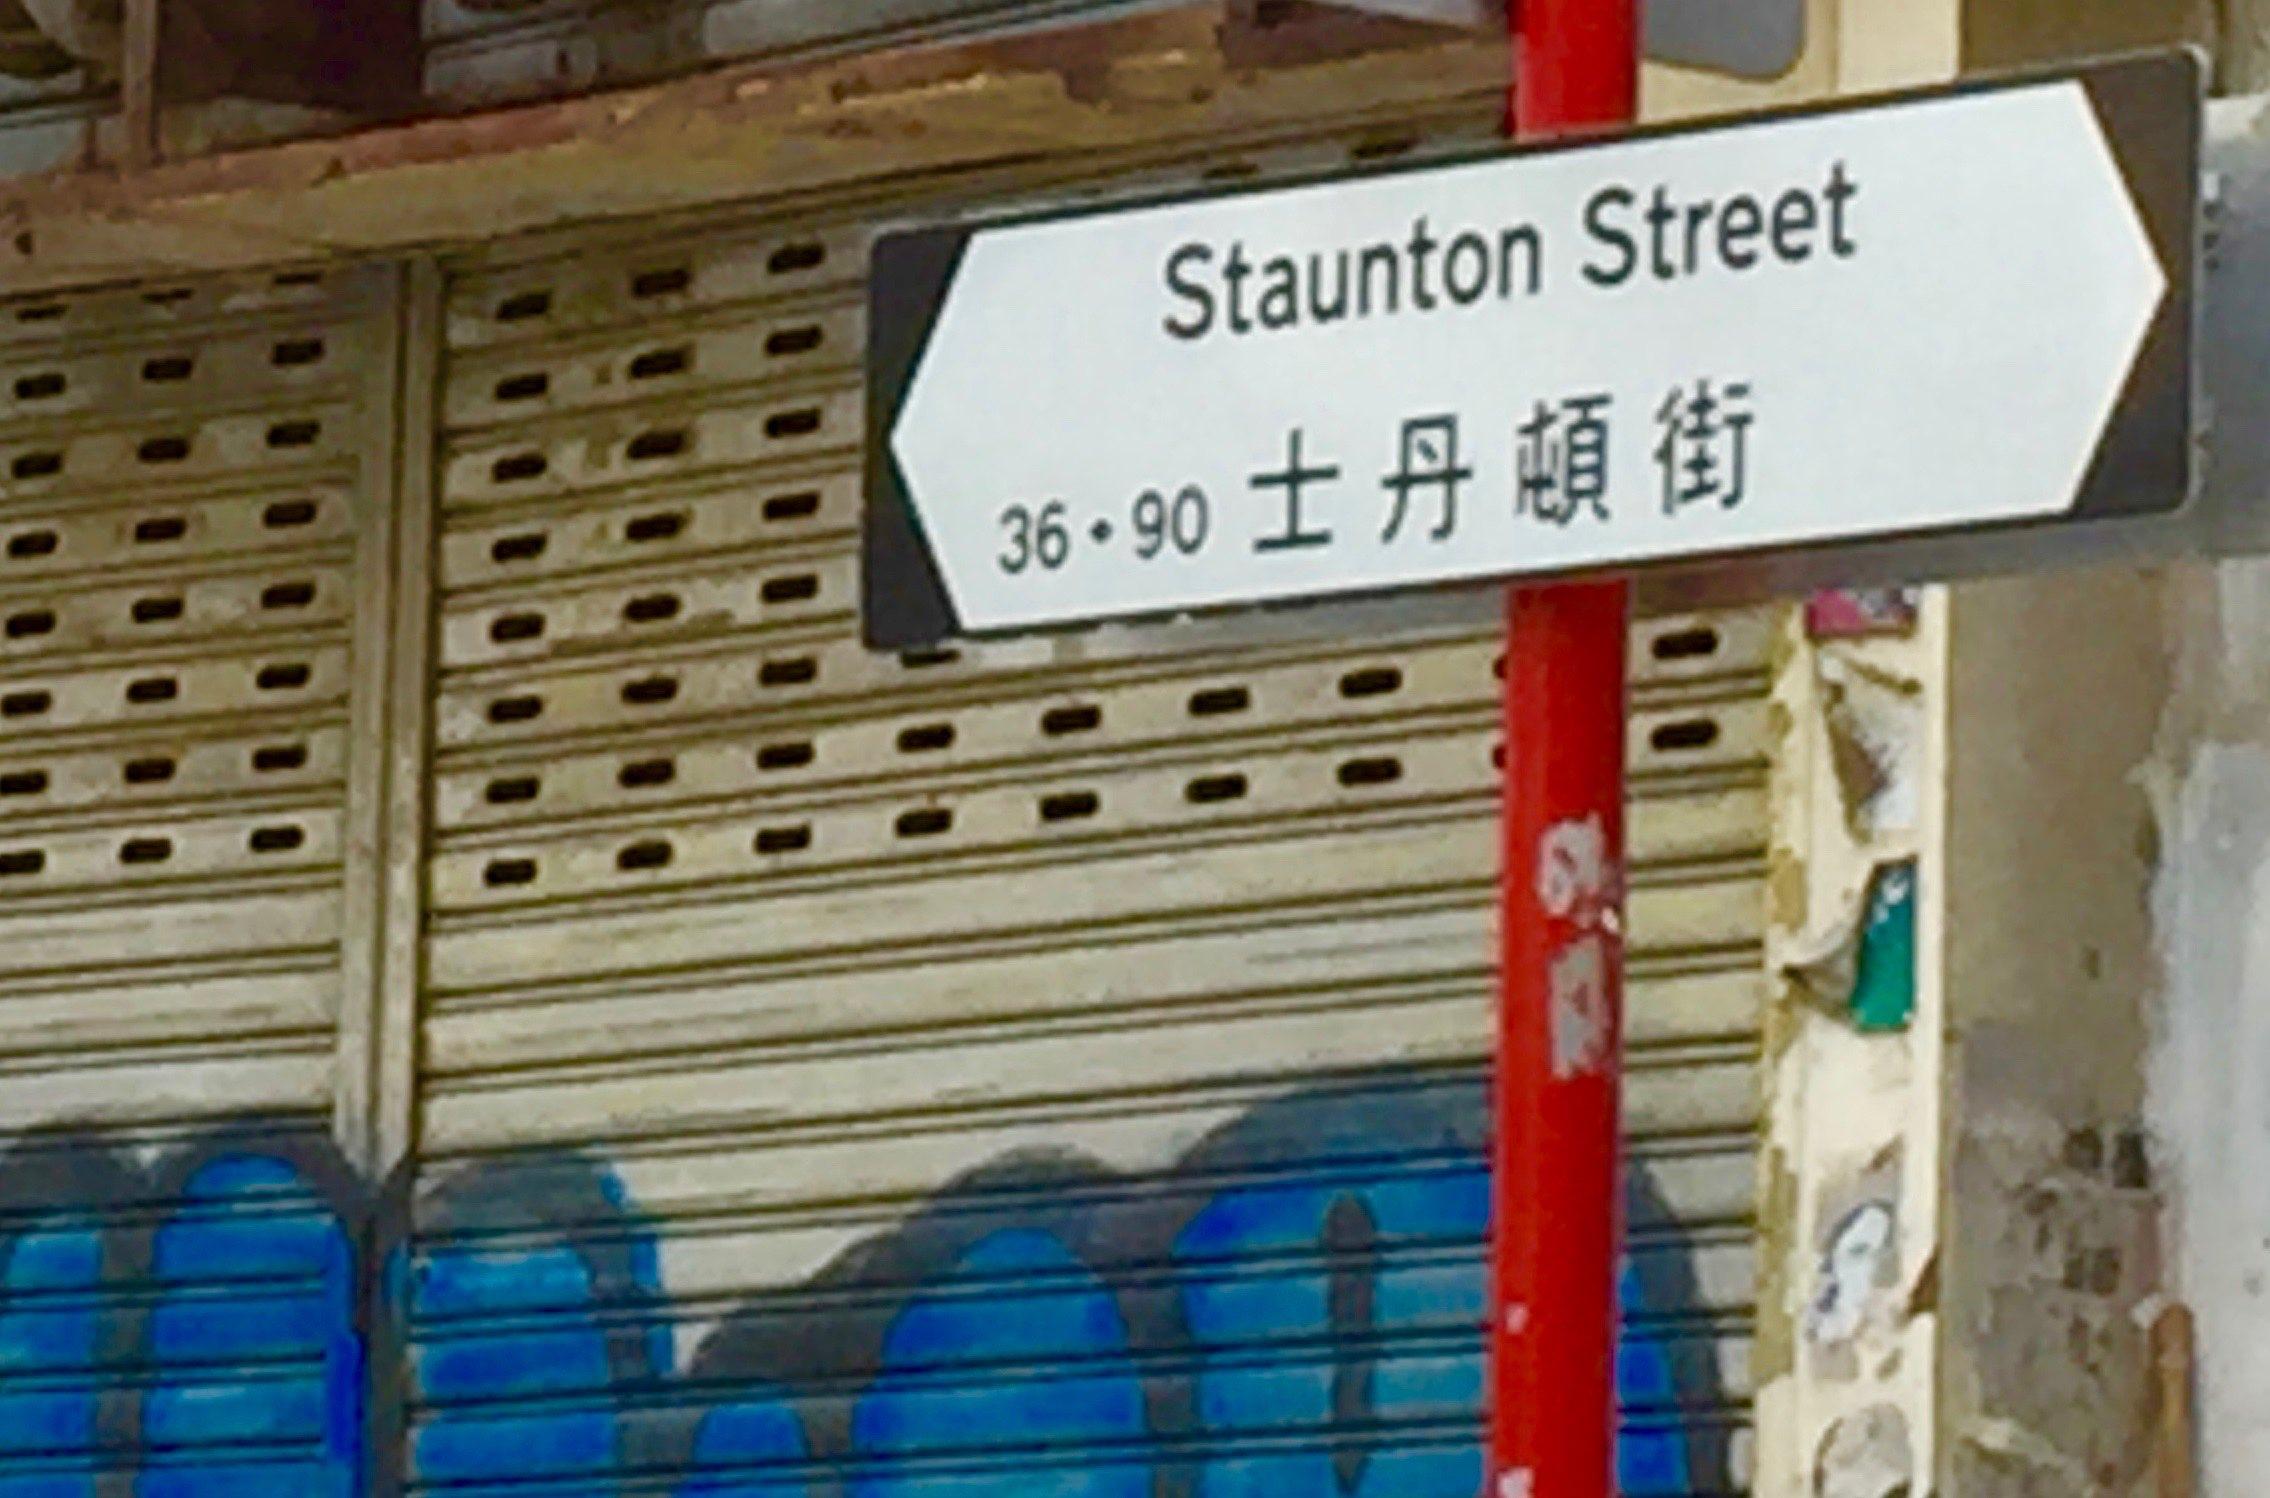 Staunton Street-haven of restaurants and bars Soho Central